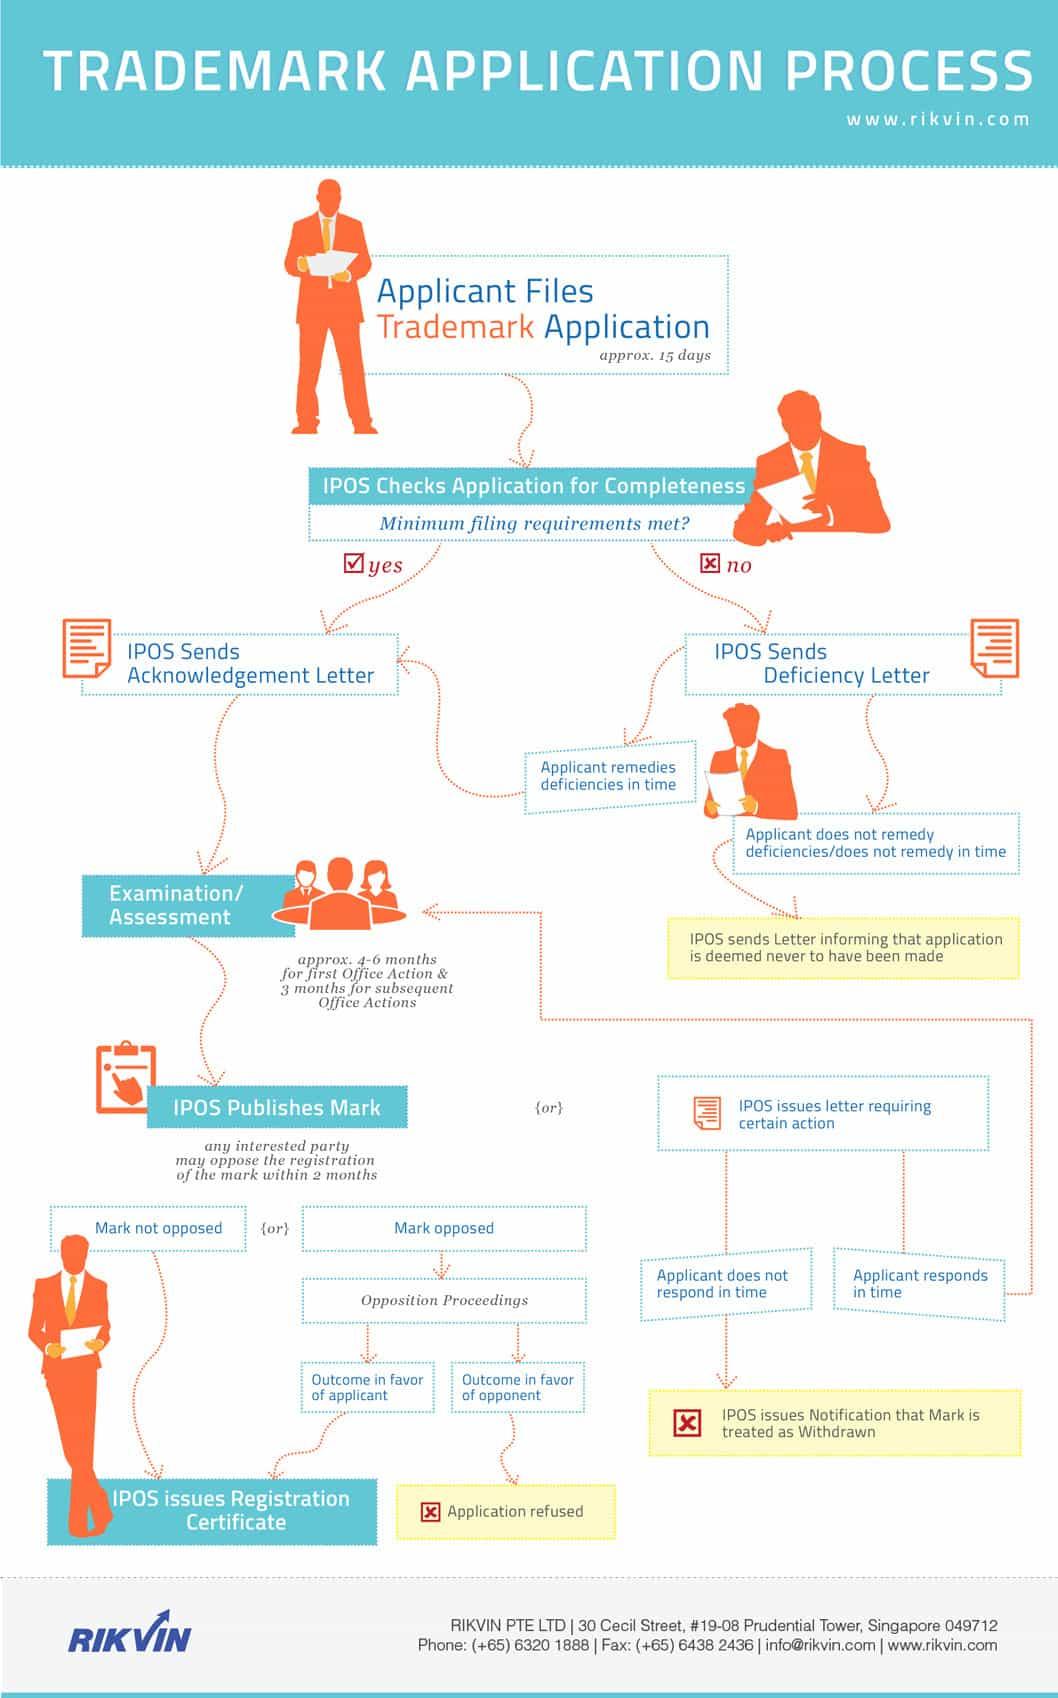 singapore-trademark-application1 Trademark Application Review Process